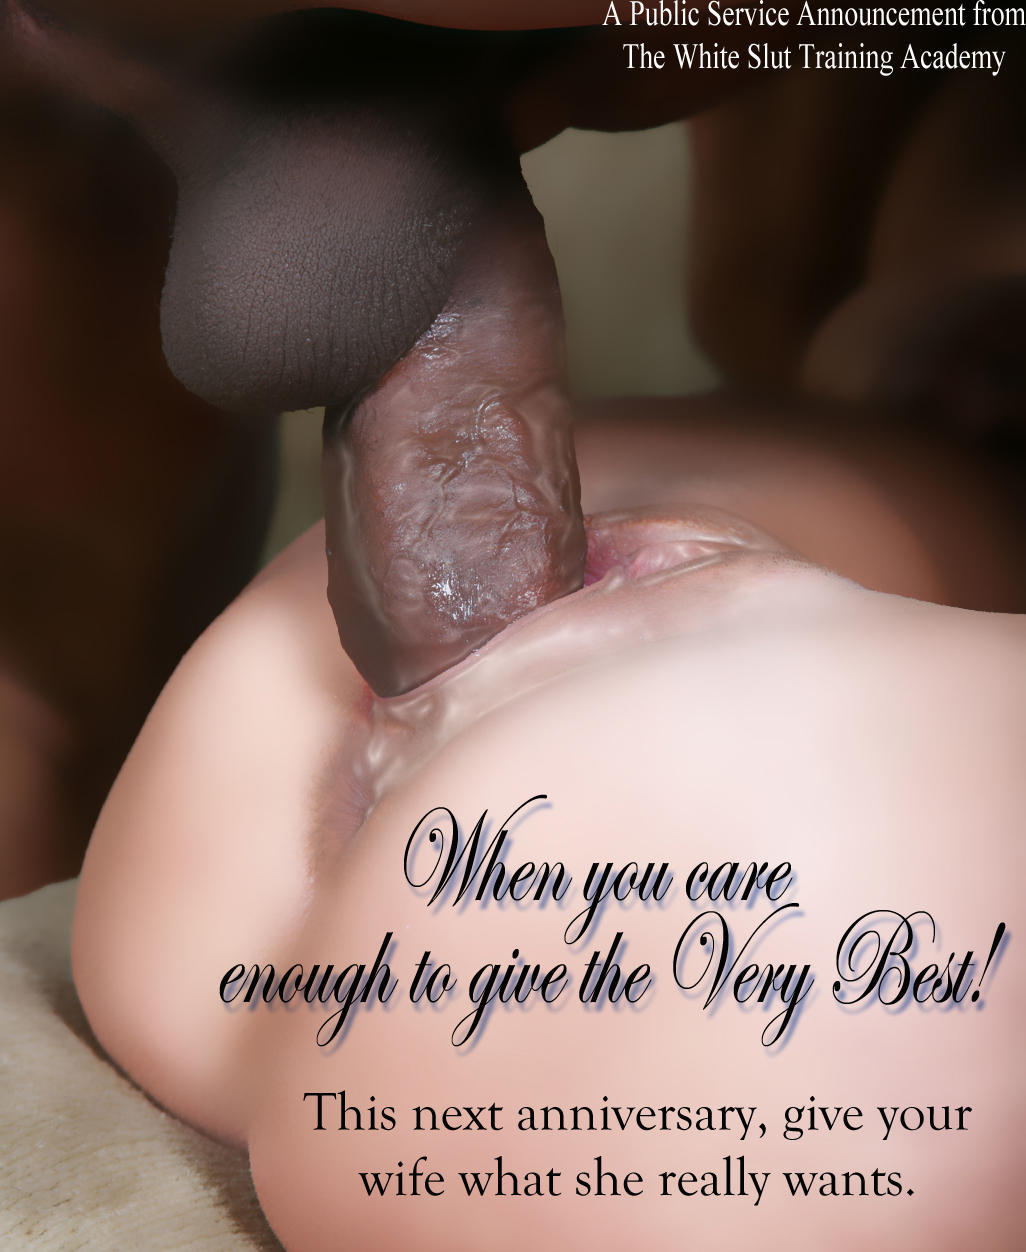 Cuckold Slave Wife Captions Datawav | CLOUDY GIRL PICS